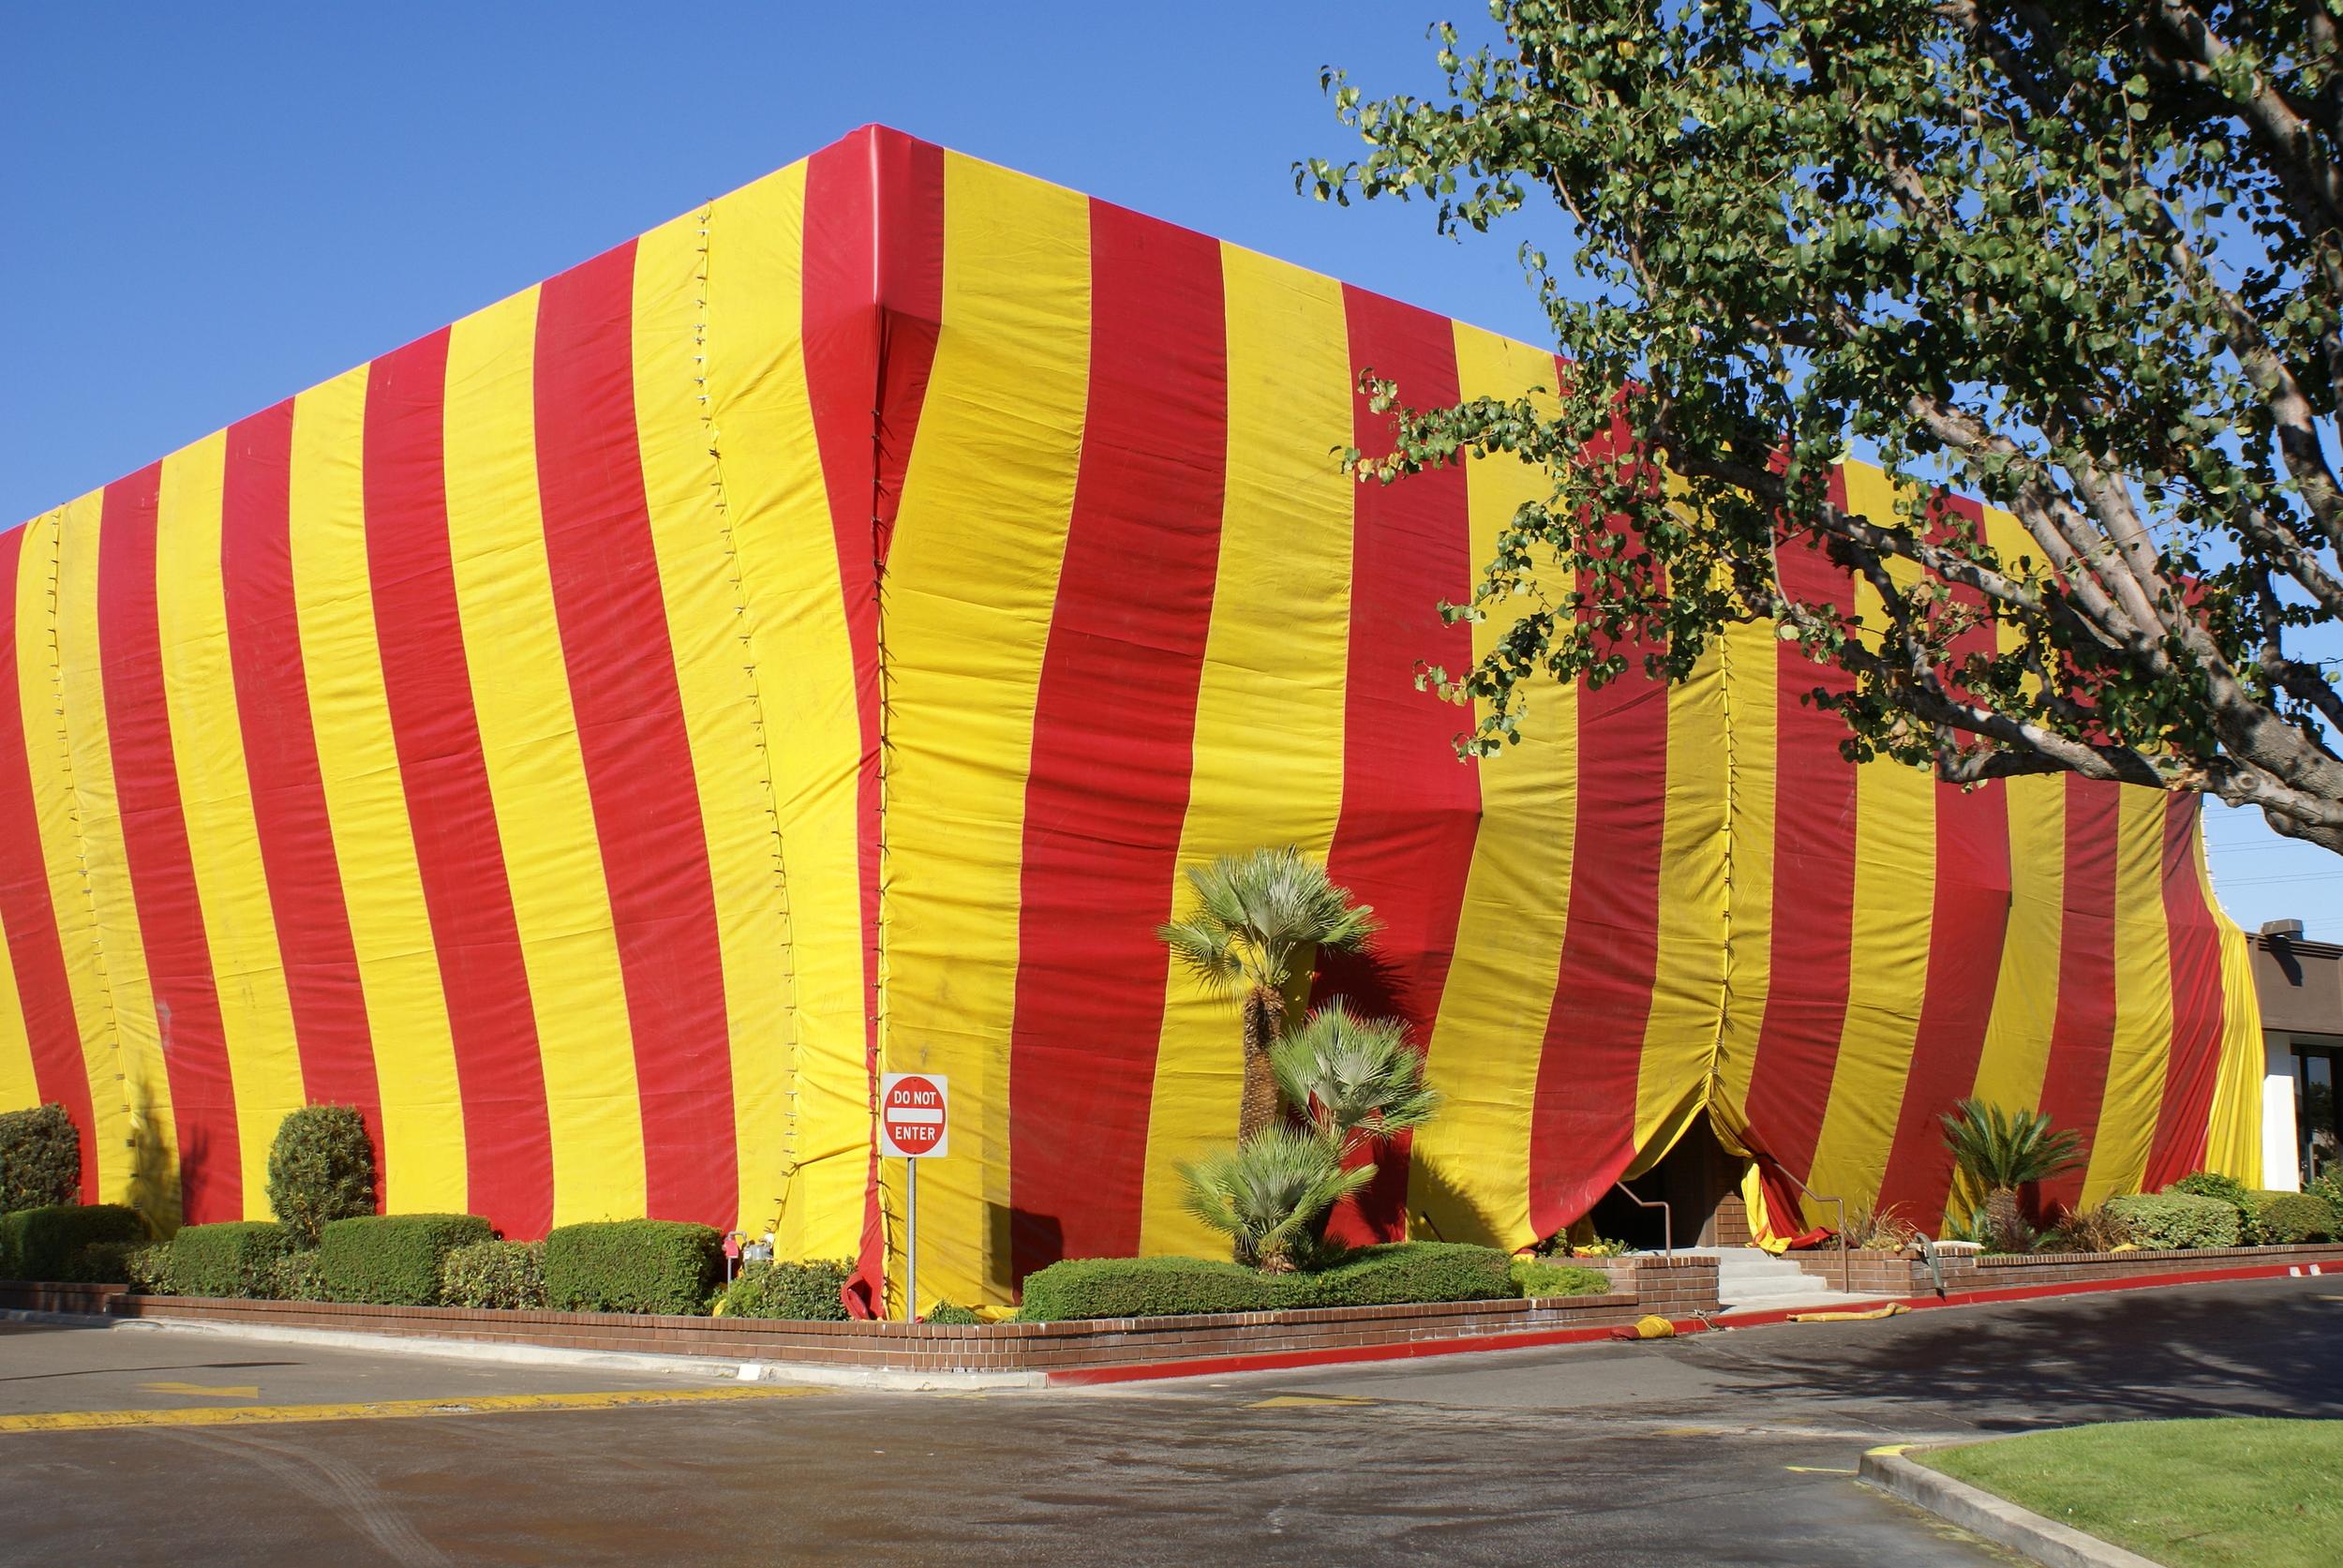 bigstock-Termite-Fumigation-Tent-Pest-C-2148482.jpg